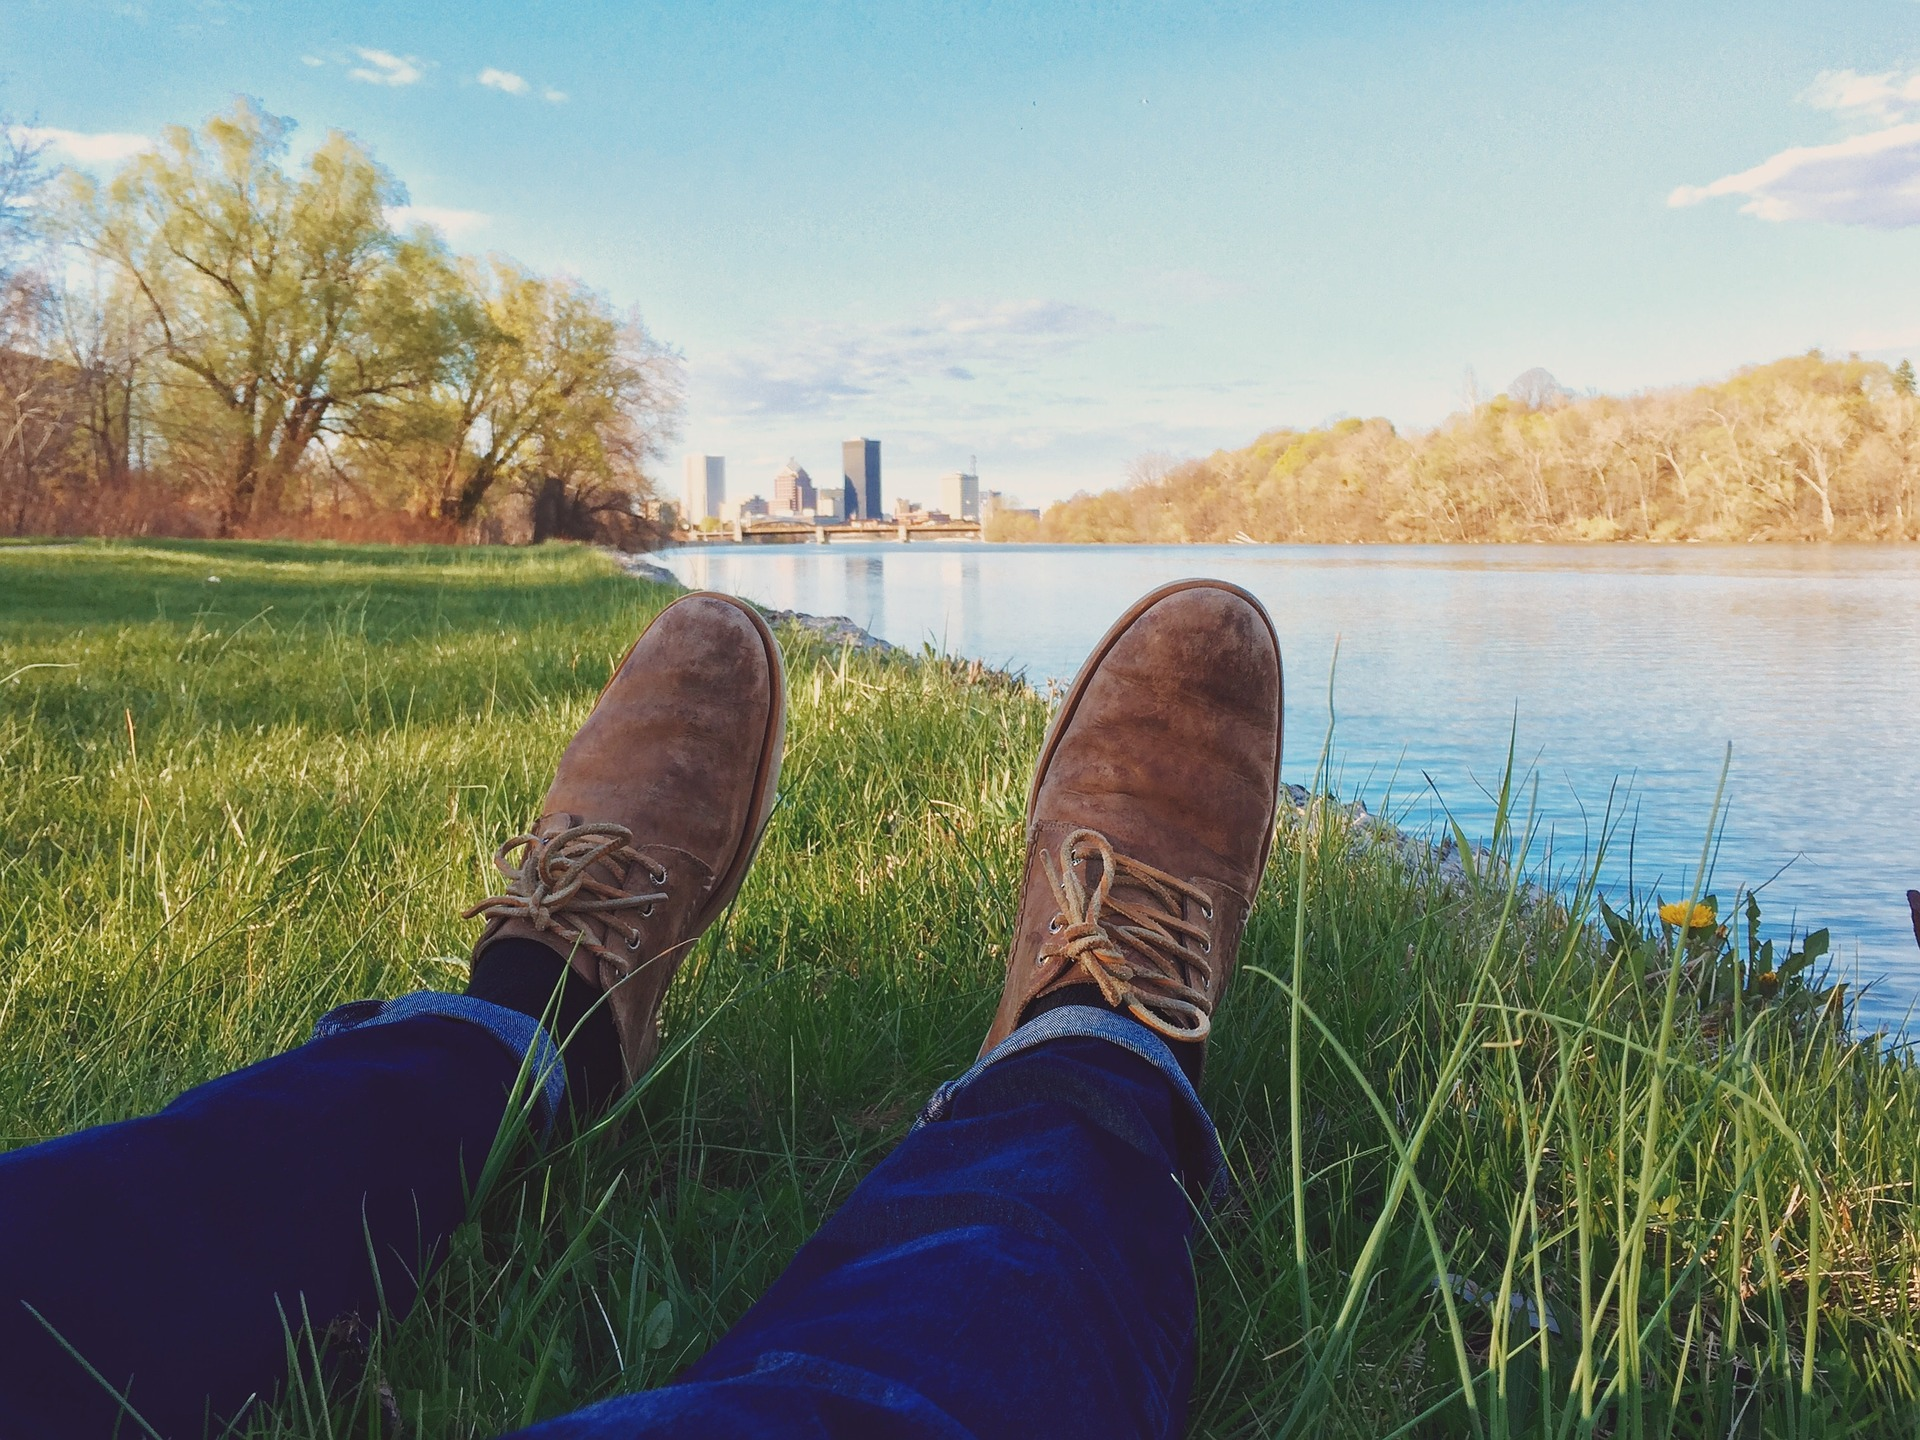 feet-768633_1920